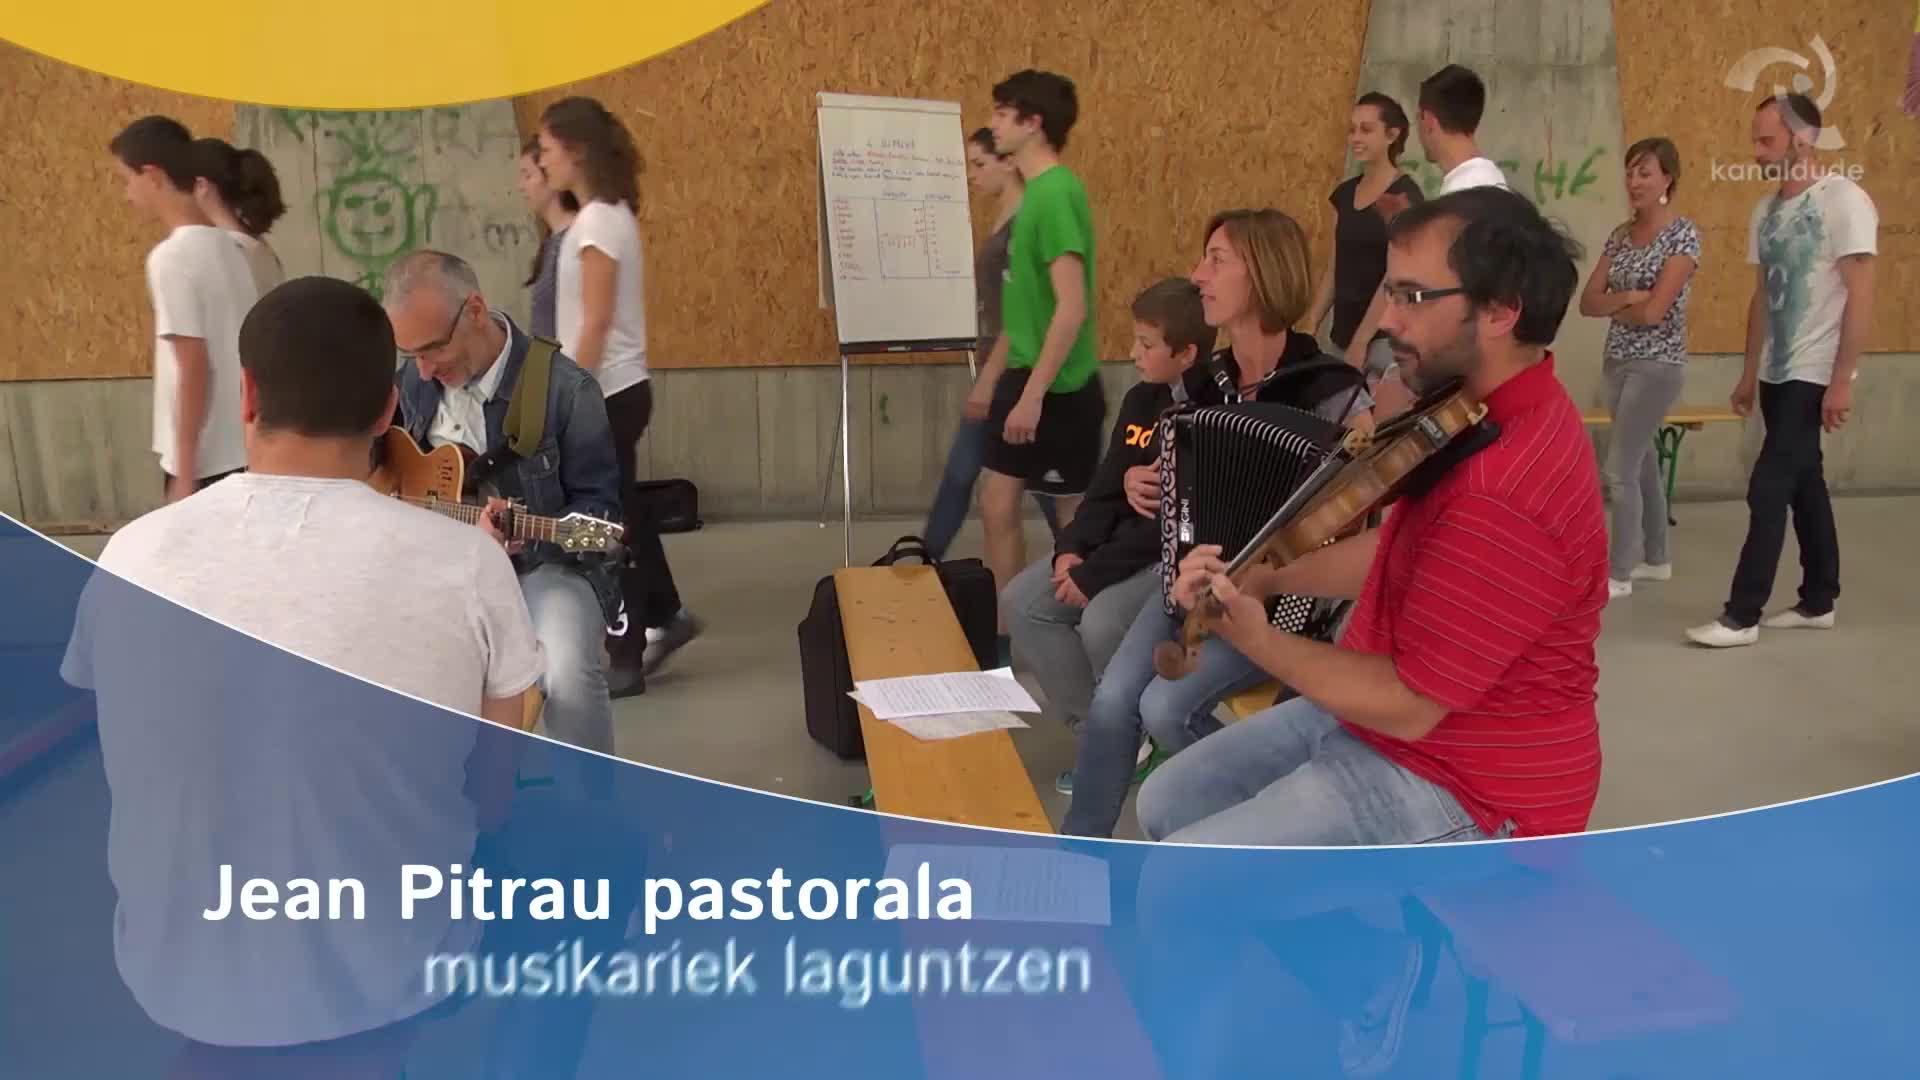 Jean Pitrau pastorala: musikariek laguntzen